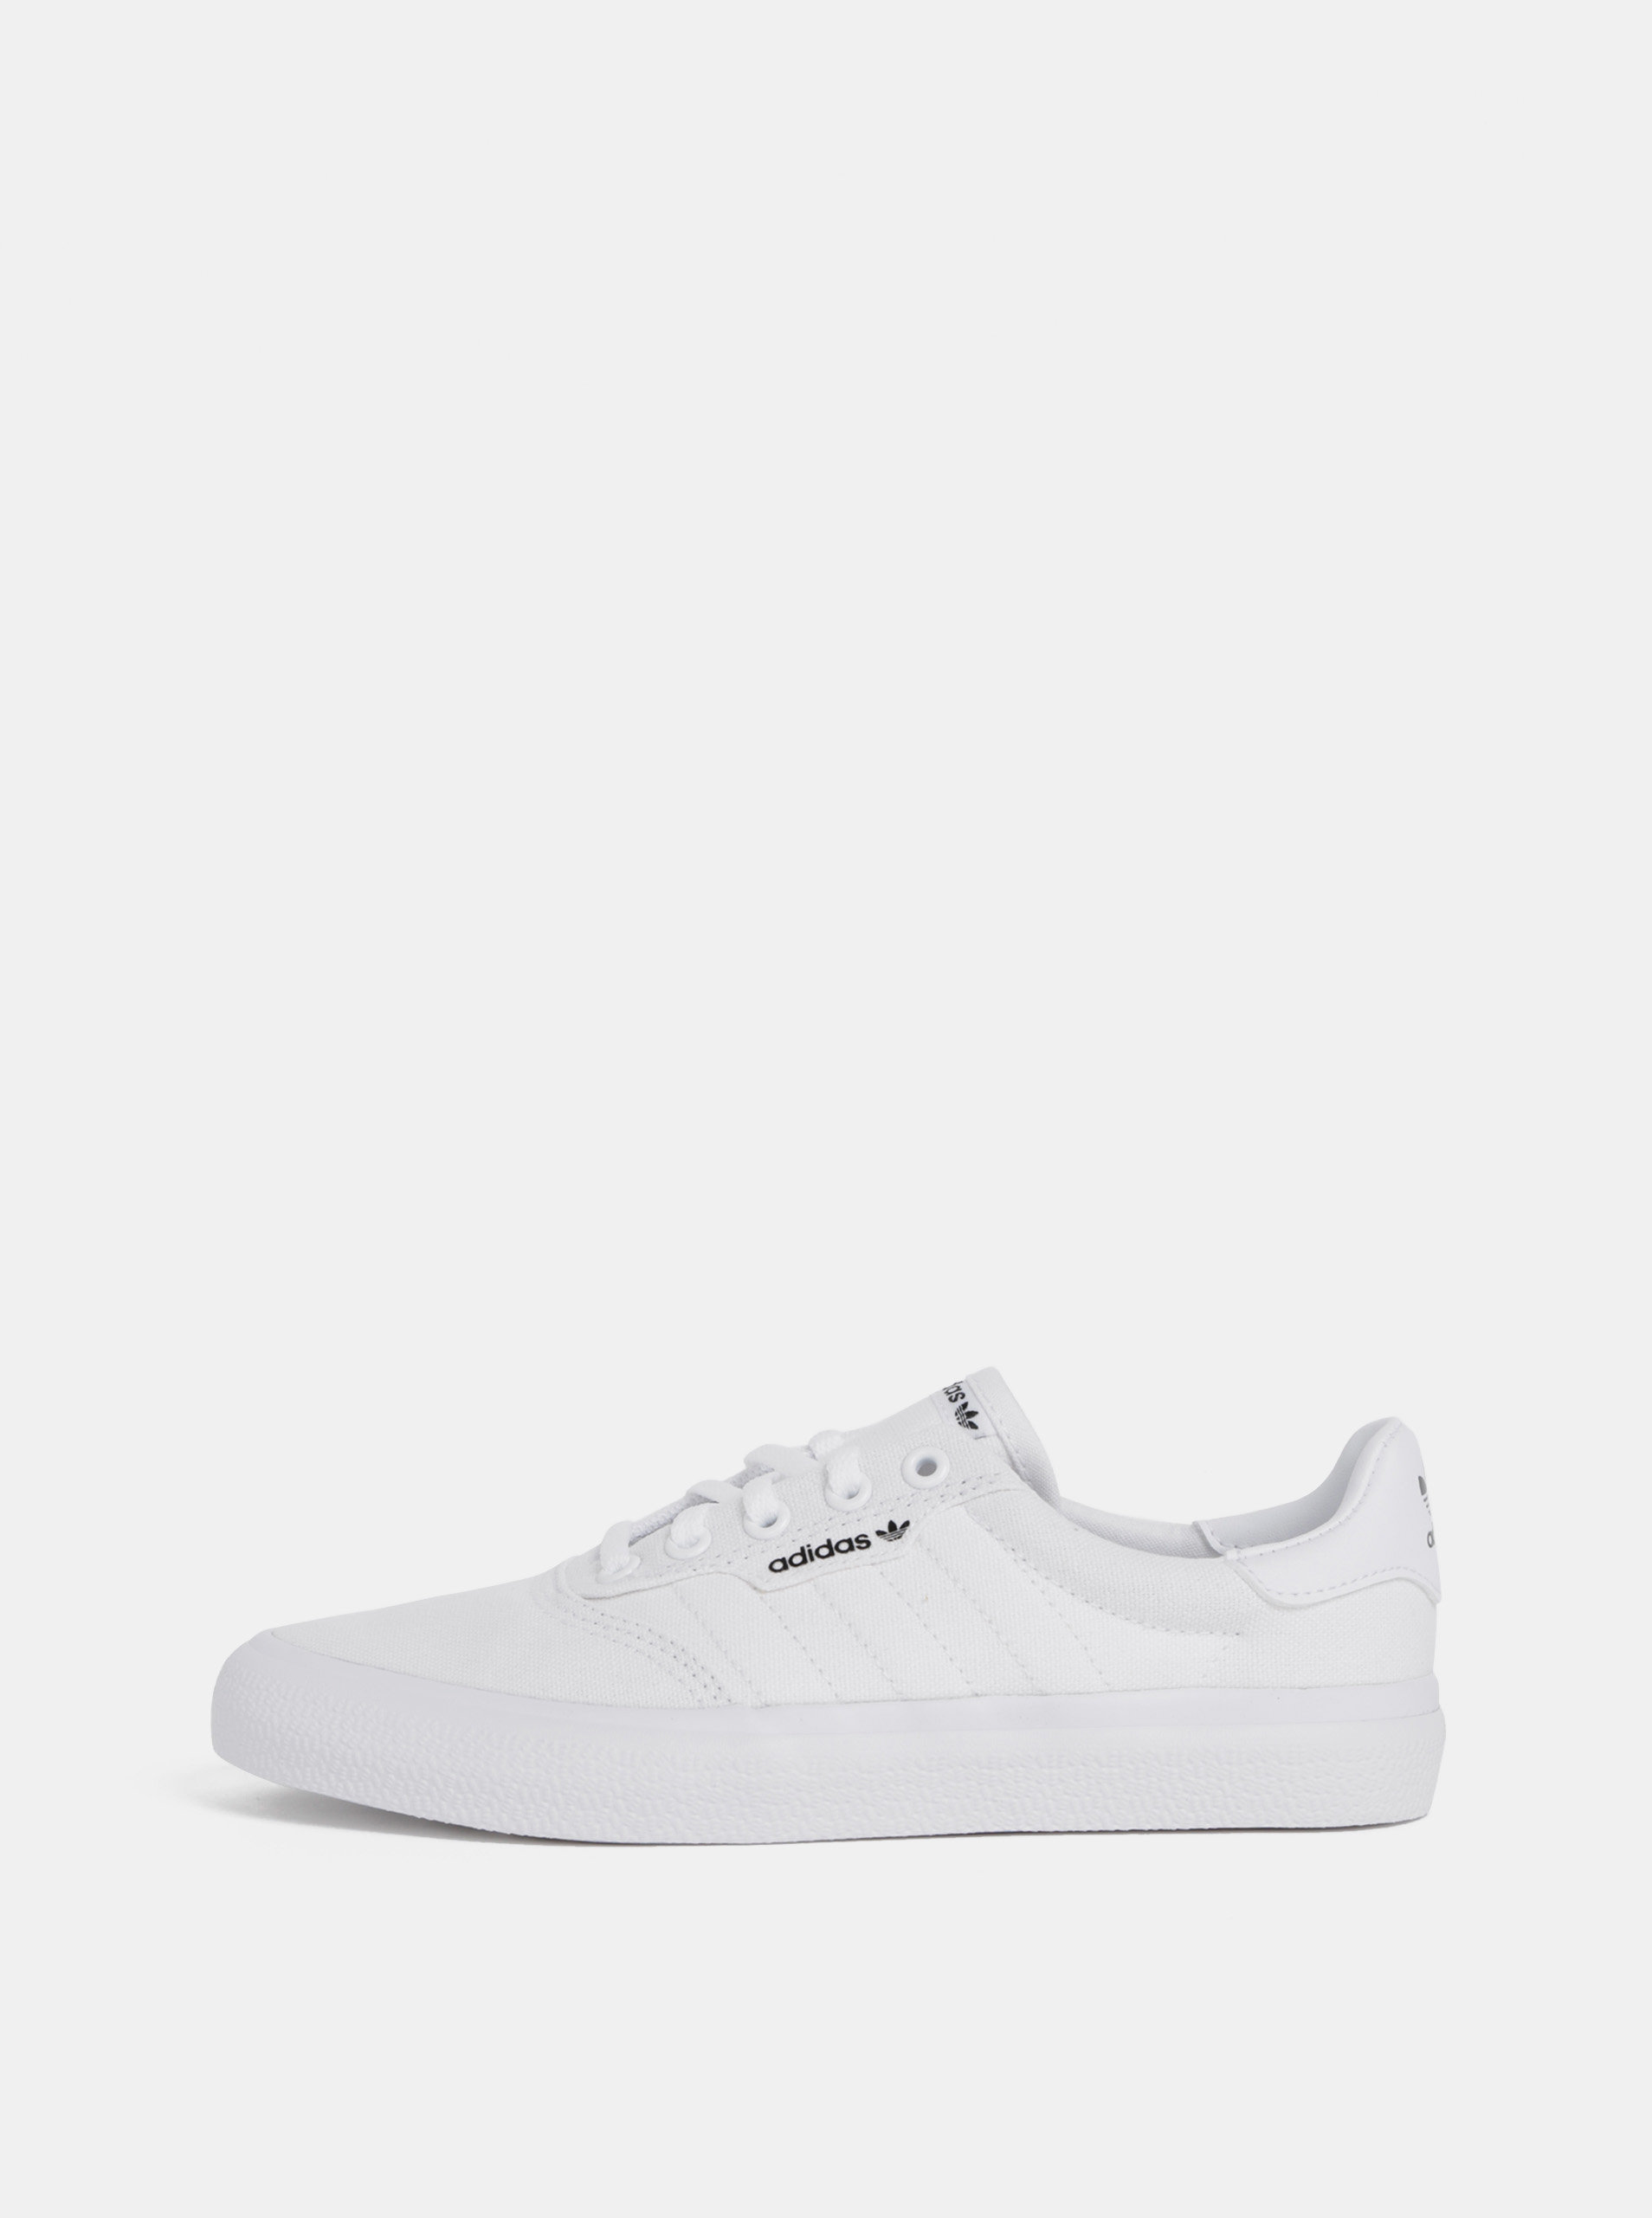 cfa012f3cc0d0 Biele dámske tenisky adidas Originals 3MC | ZOOT.sk